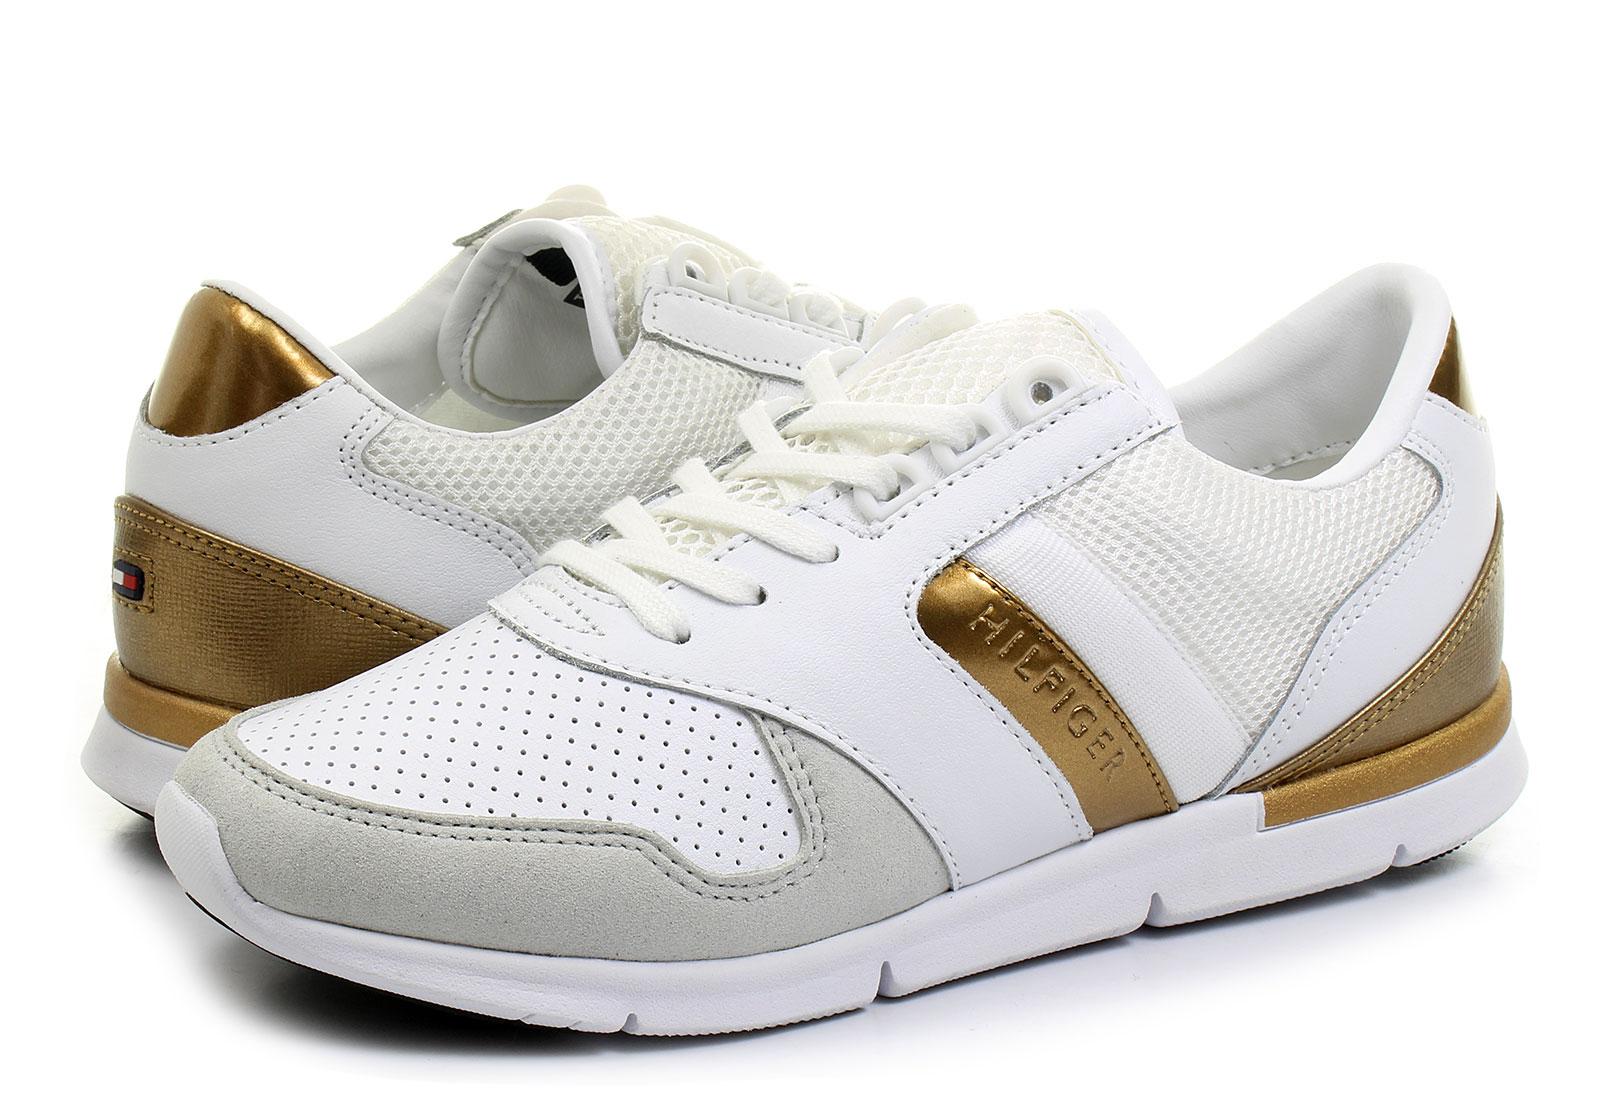 8a4ca6d8ed Tommy Hilfiger Cipő - Skye 1z1 - 16S-0811-118 - Office Shoes Magyarország